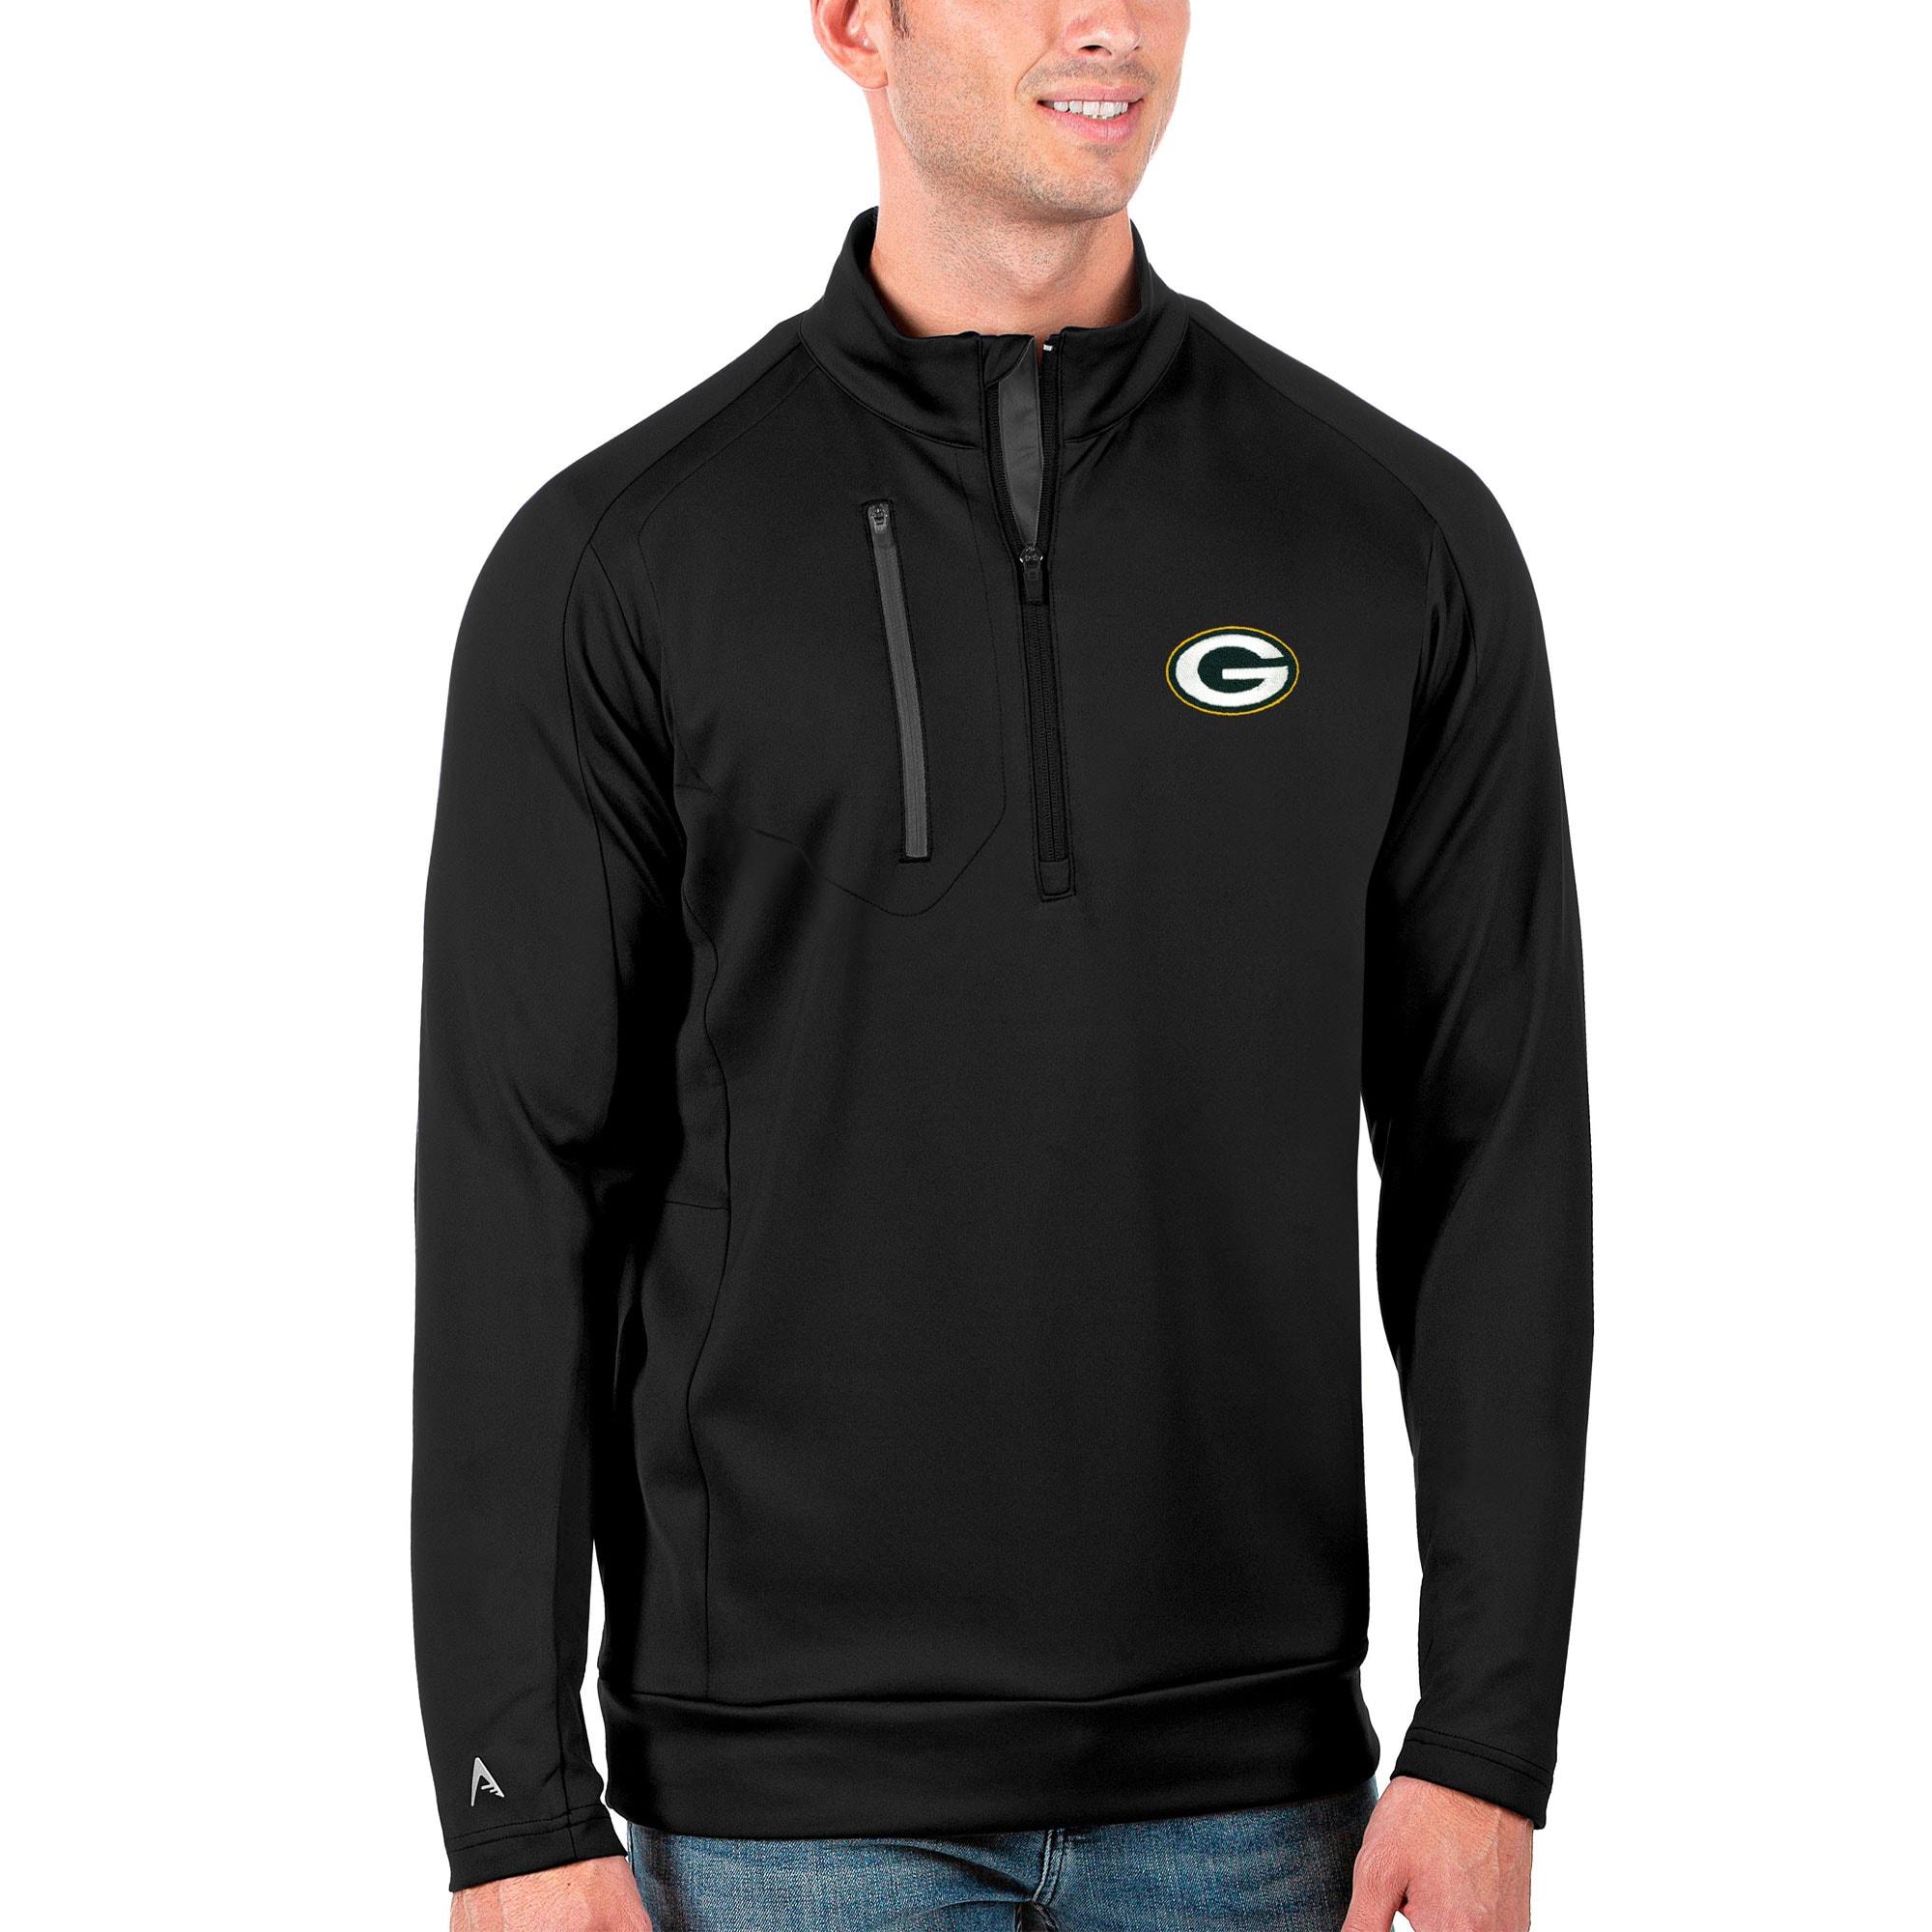 Green Bay Packers Antigua Generation Quarter-Zip Pullover Jacket - Black/Charcoal